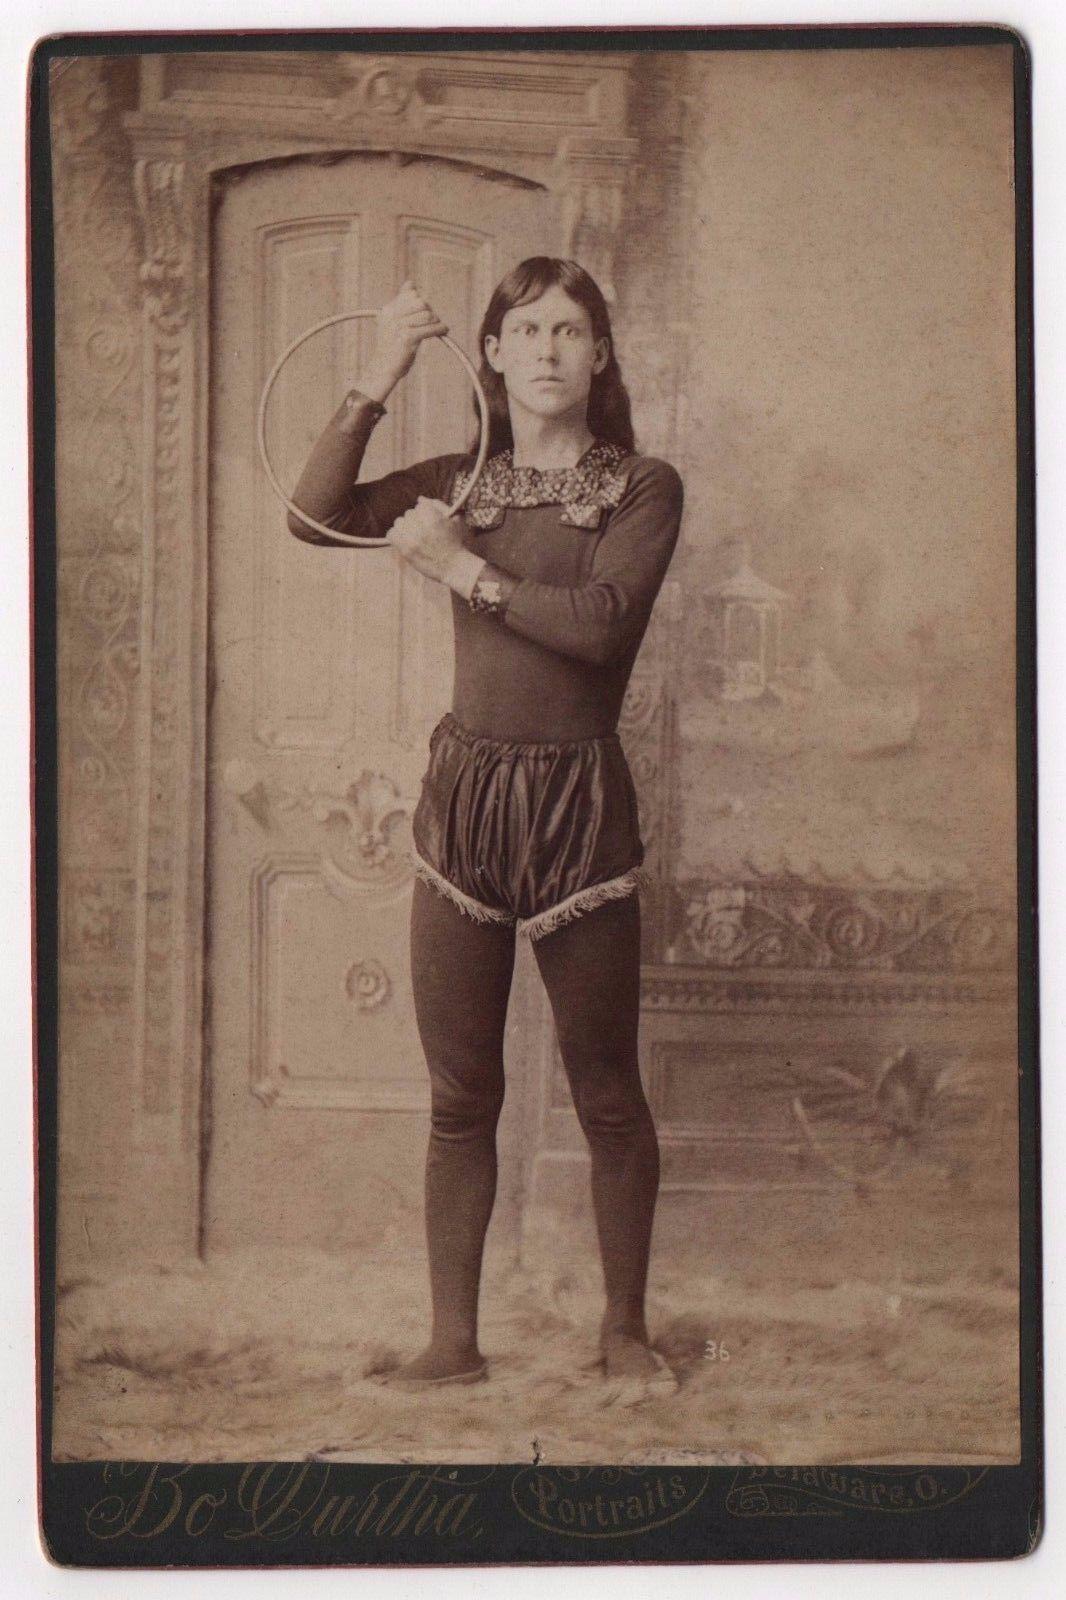 Native American Indian Circus